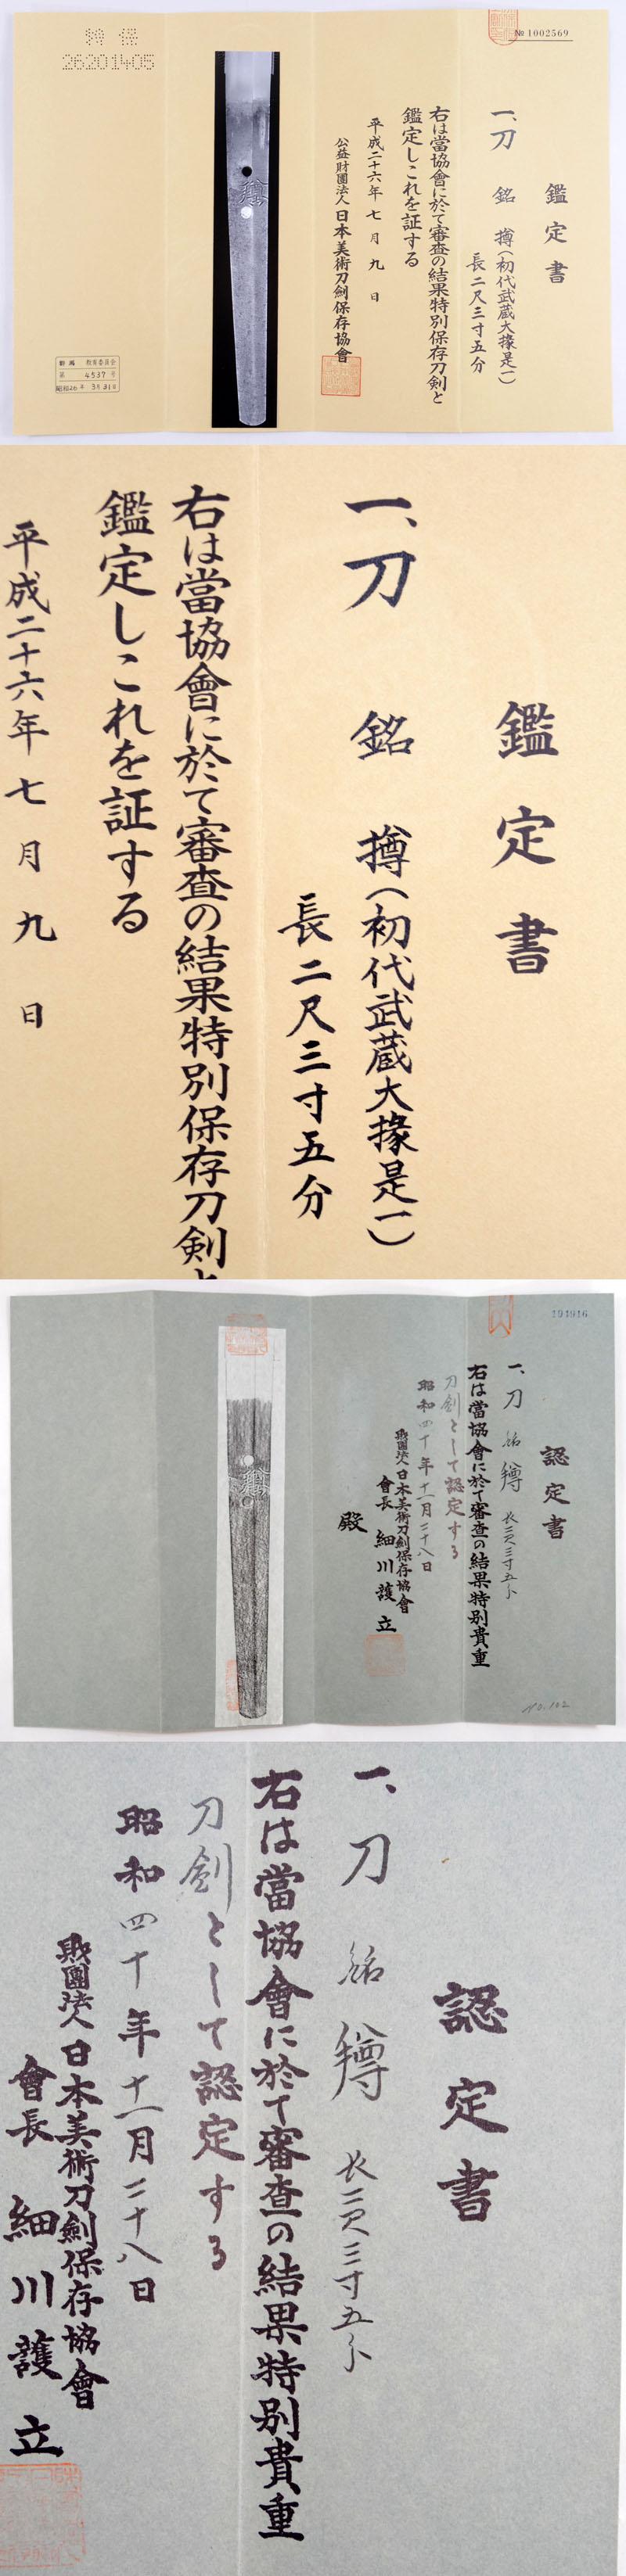 墫(初代武蔵大掾是1) Picture of Certificate